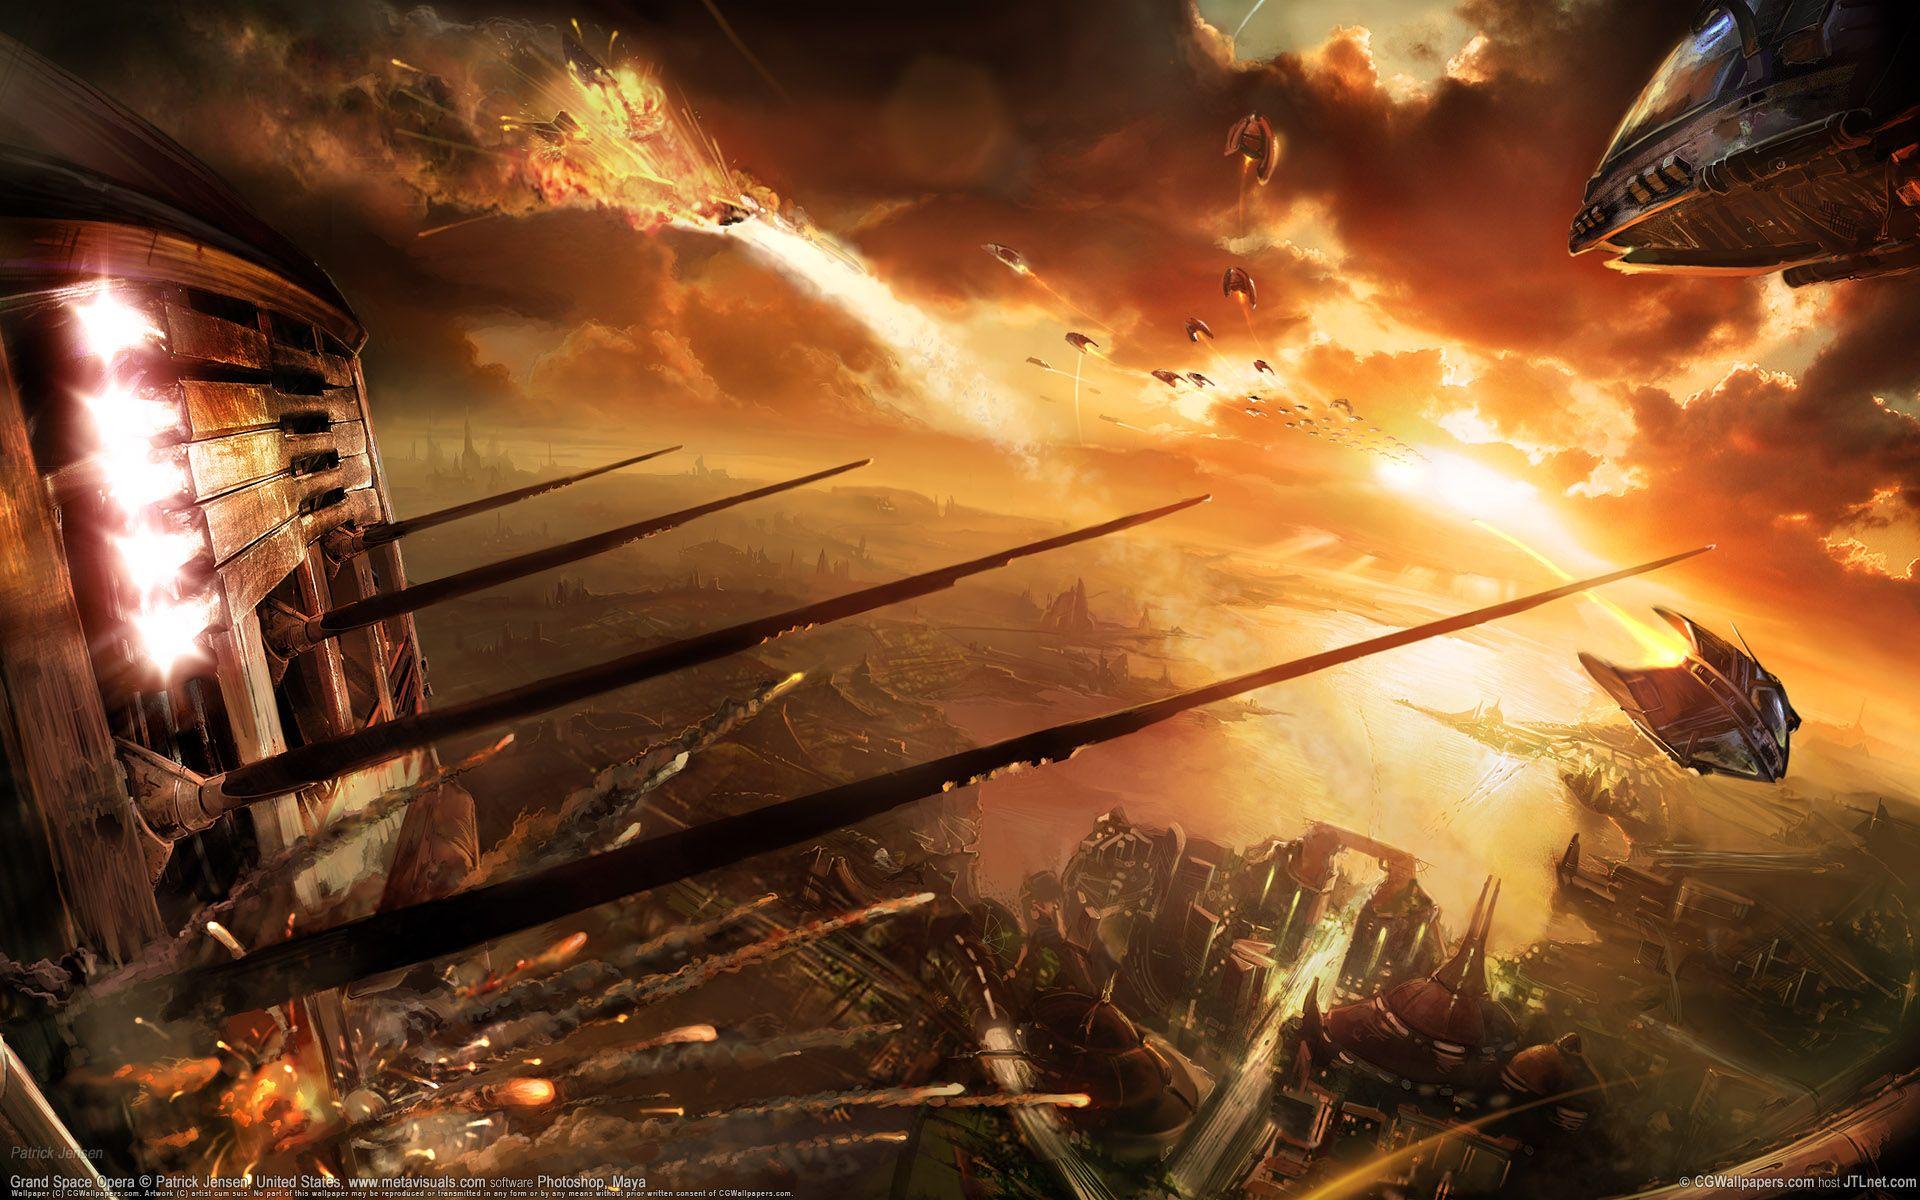 Epic Space War Wallpaper For Windows Tkg Scifi Fantasy Art Fantasy Landscape Science Fiction Artwork